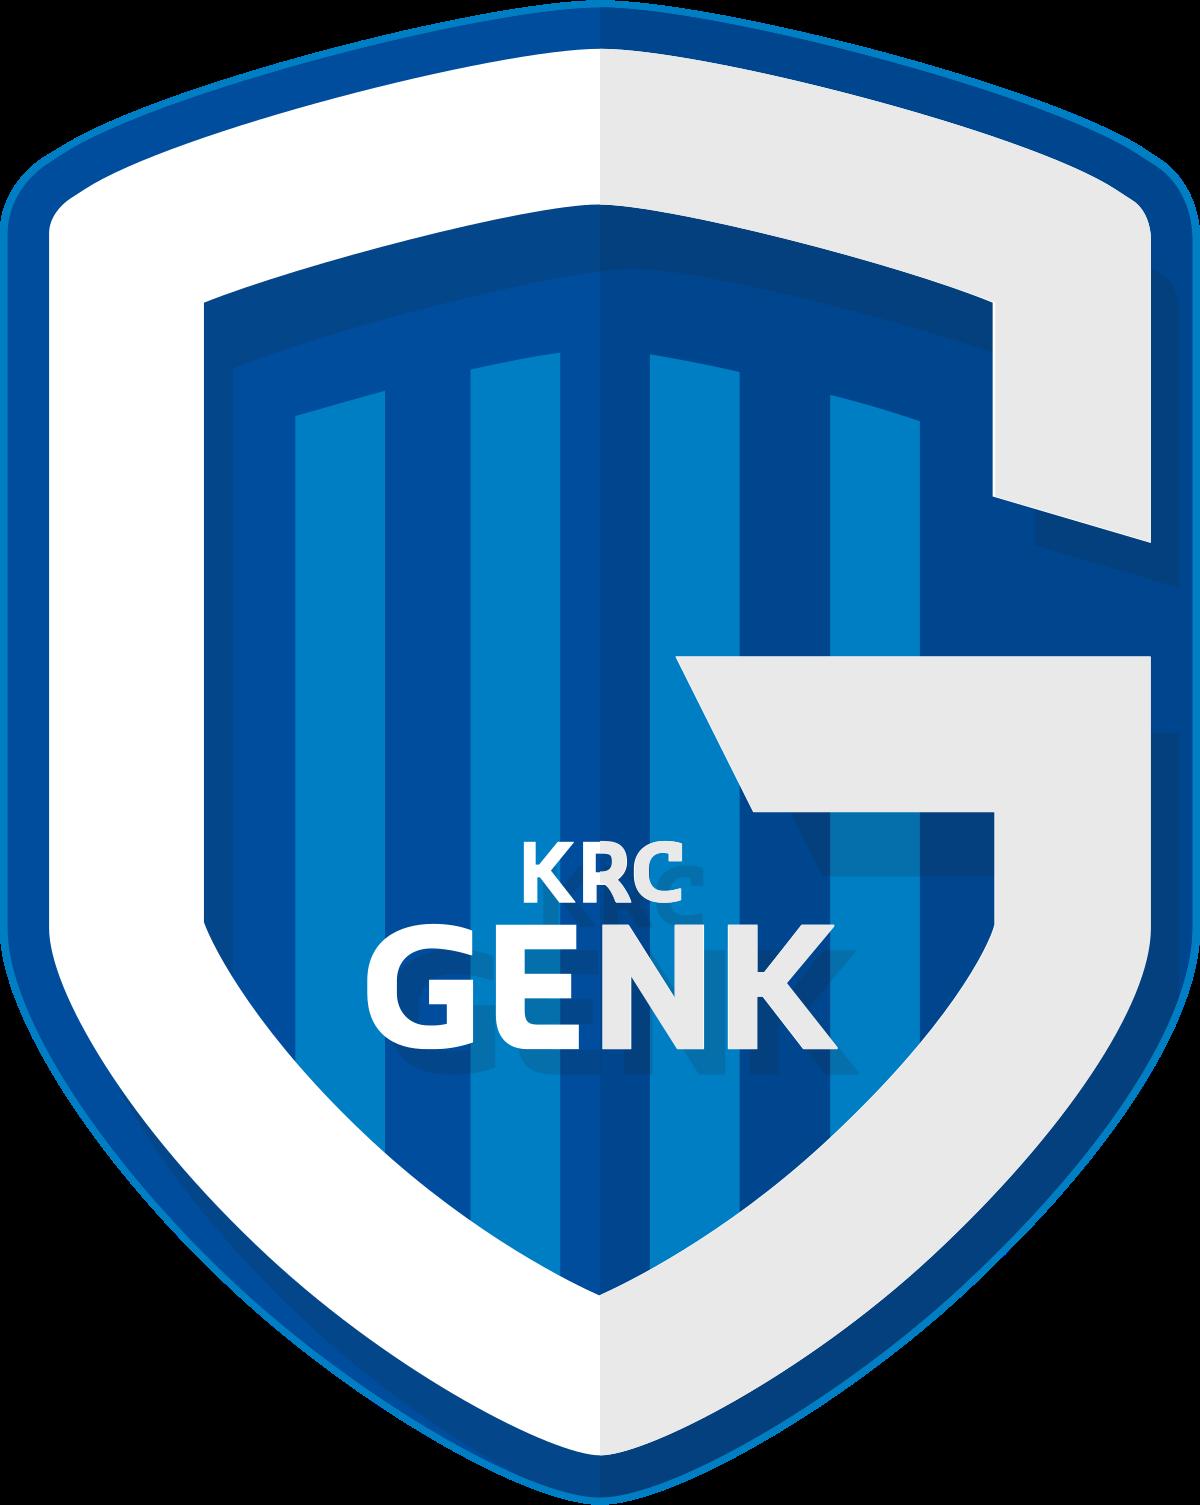 KRC_Genk_Logo_2016.svg